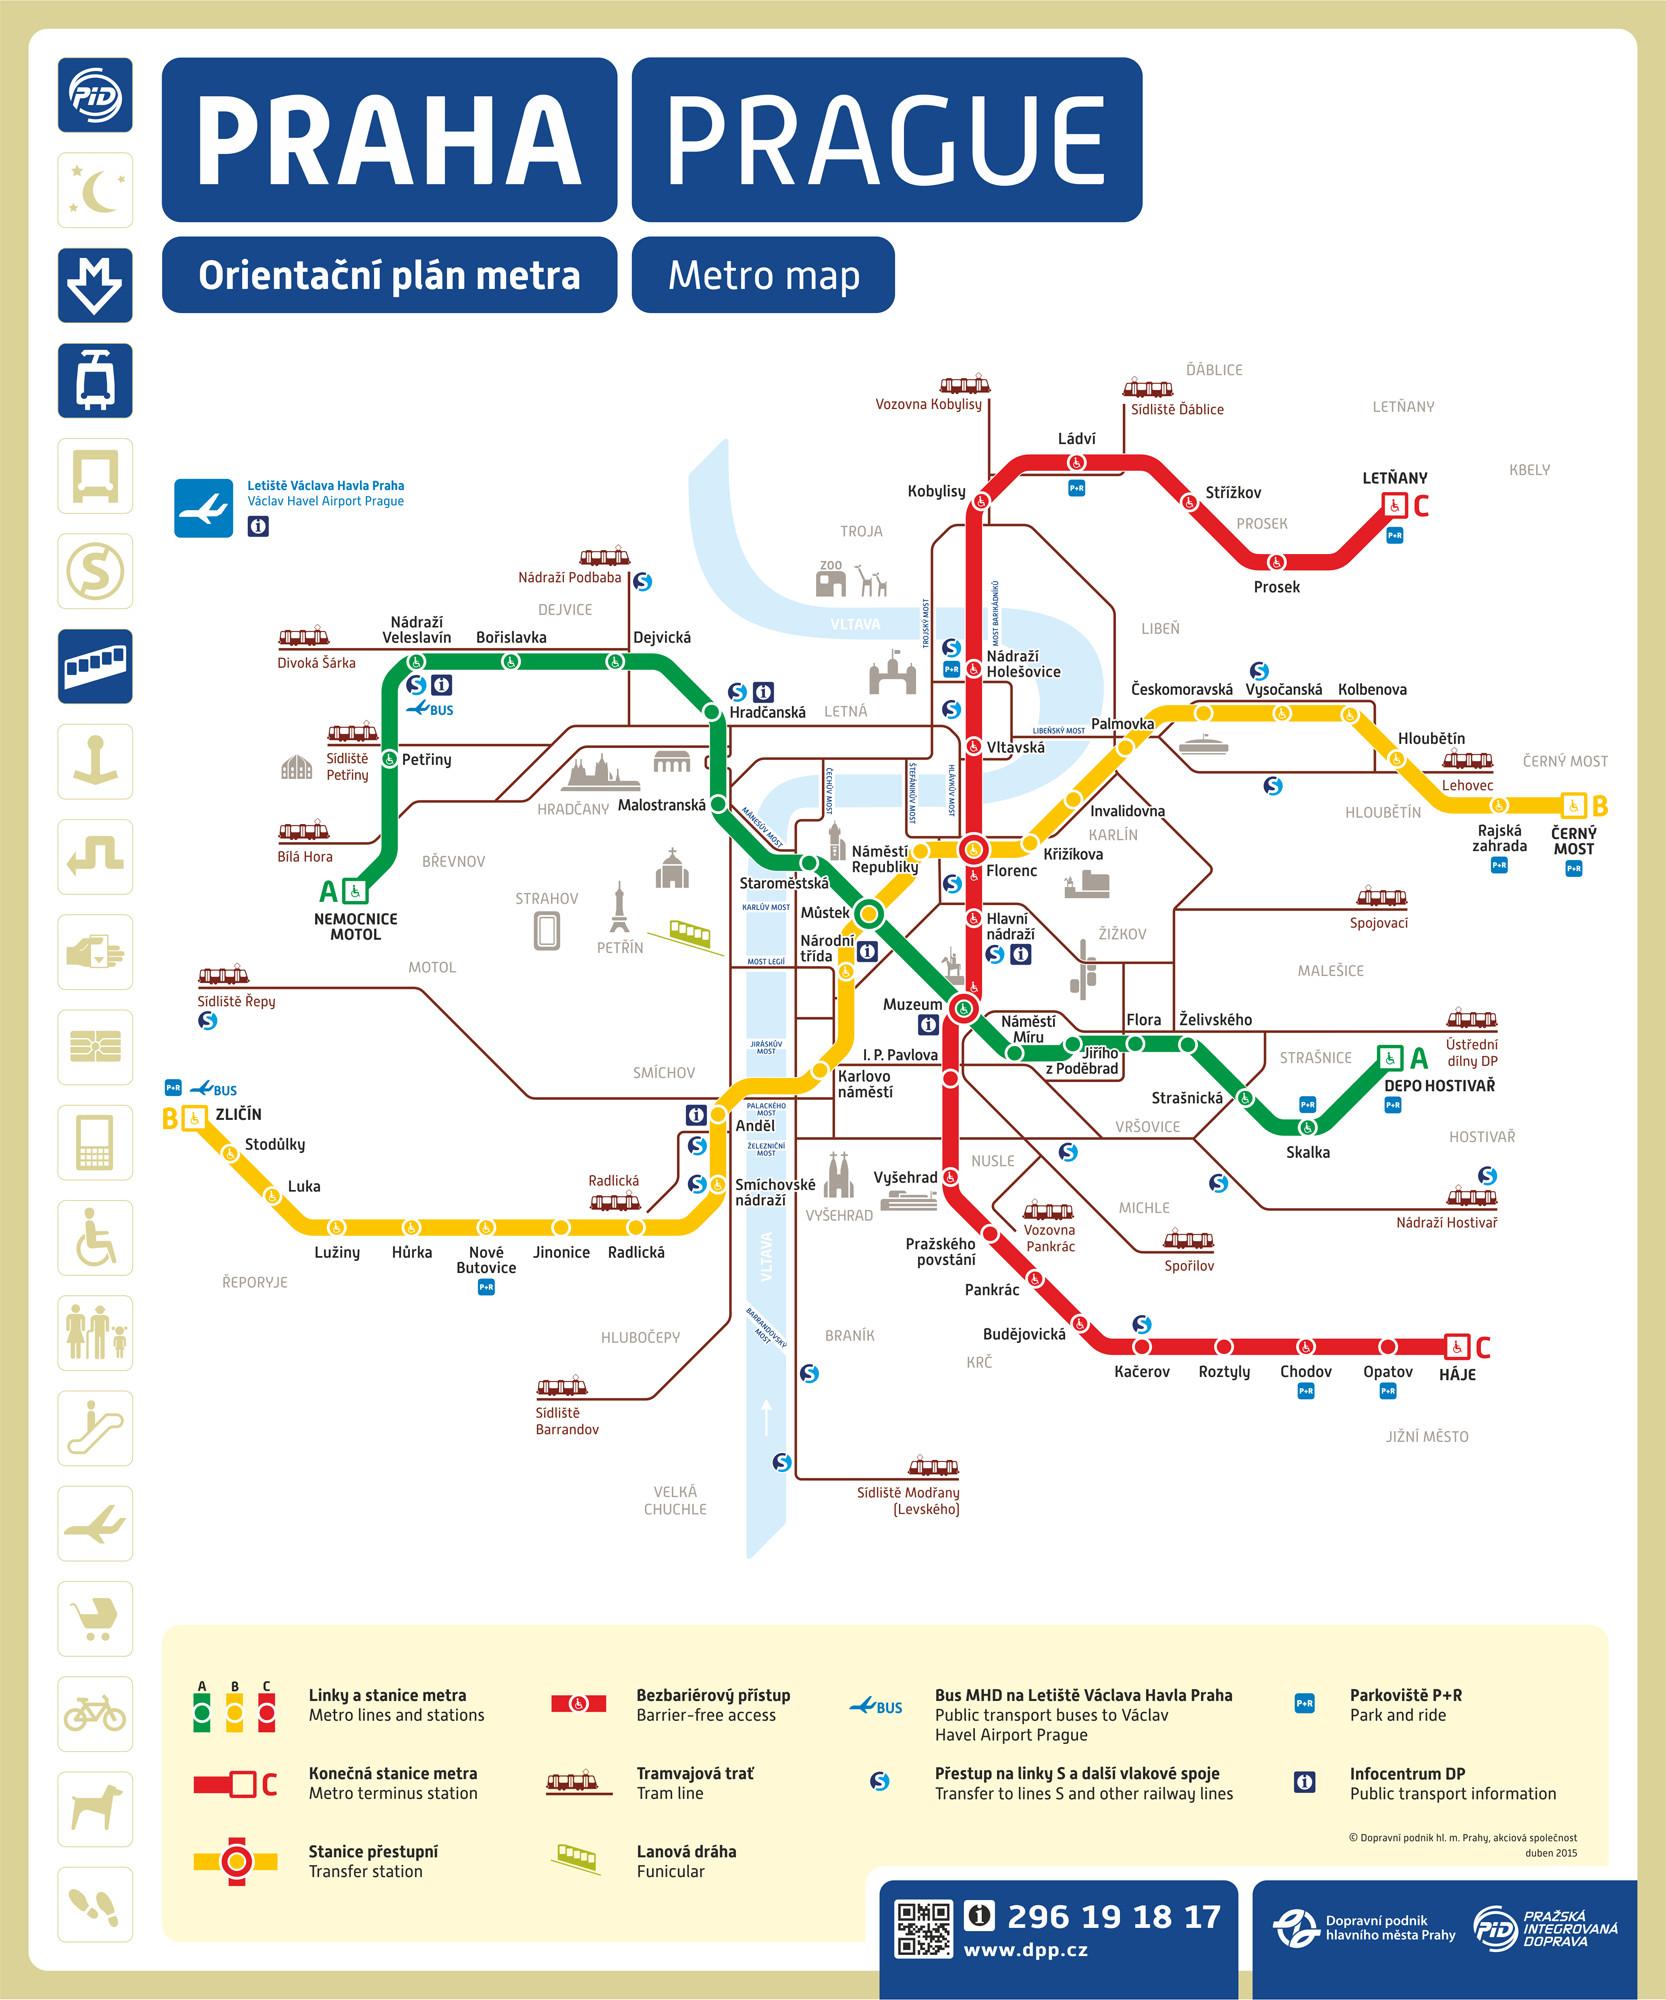 metro map of prague full resolution